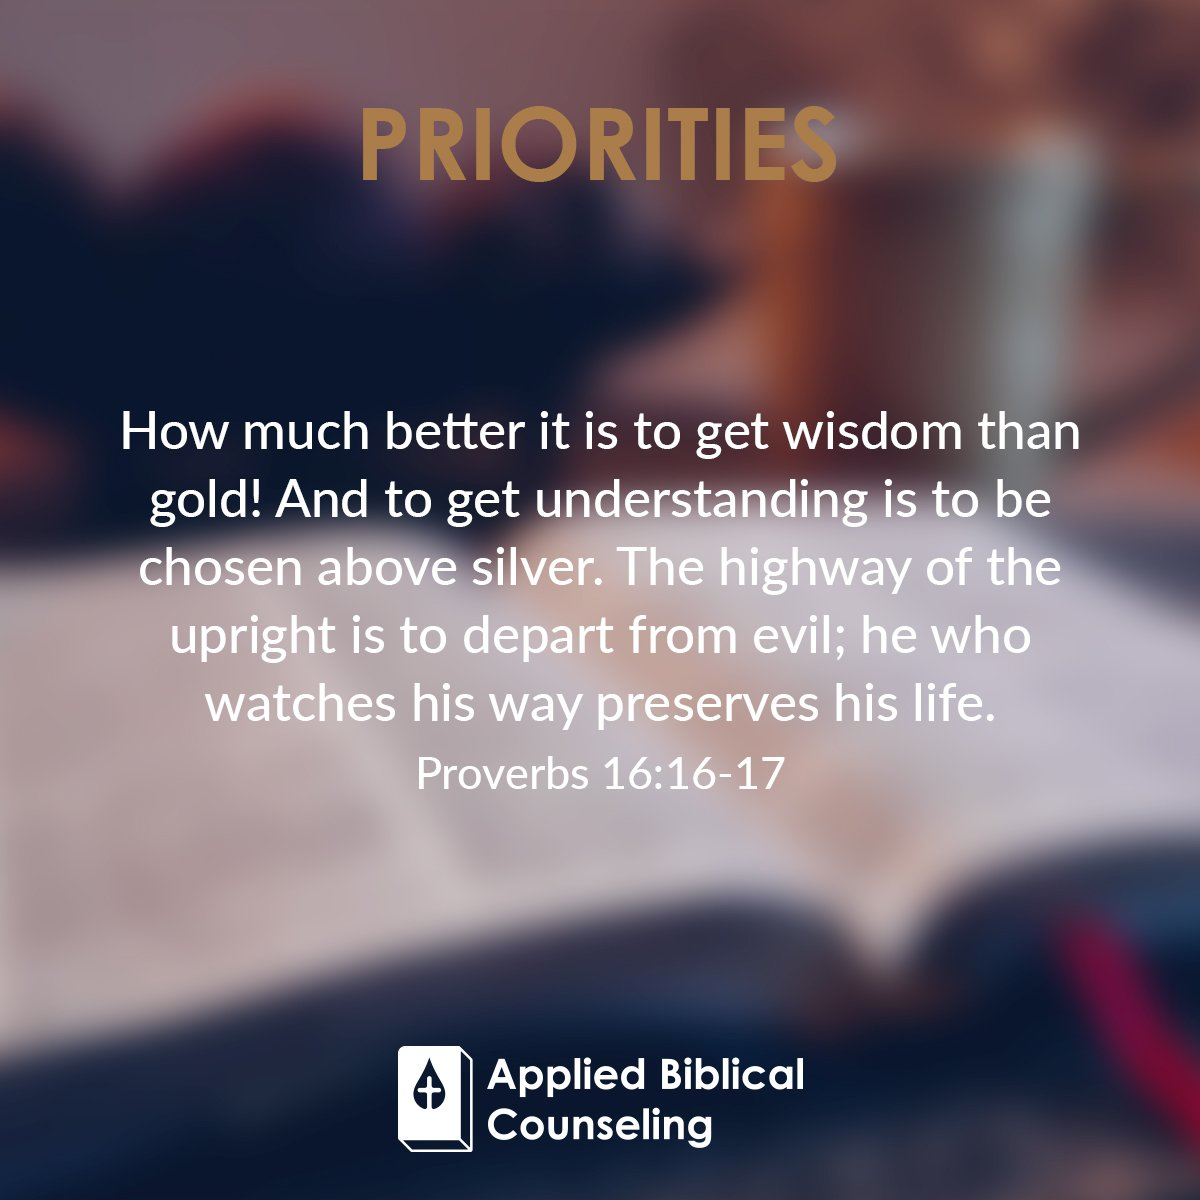 Priorities 4